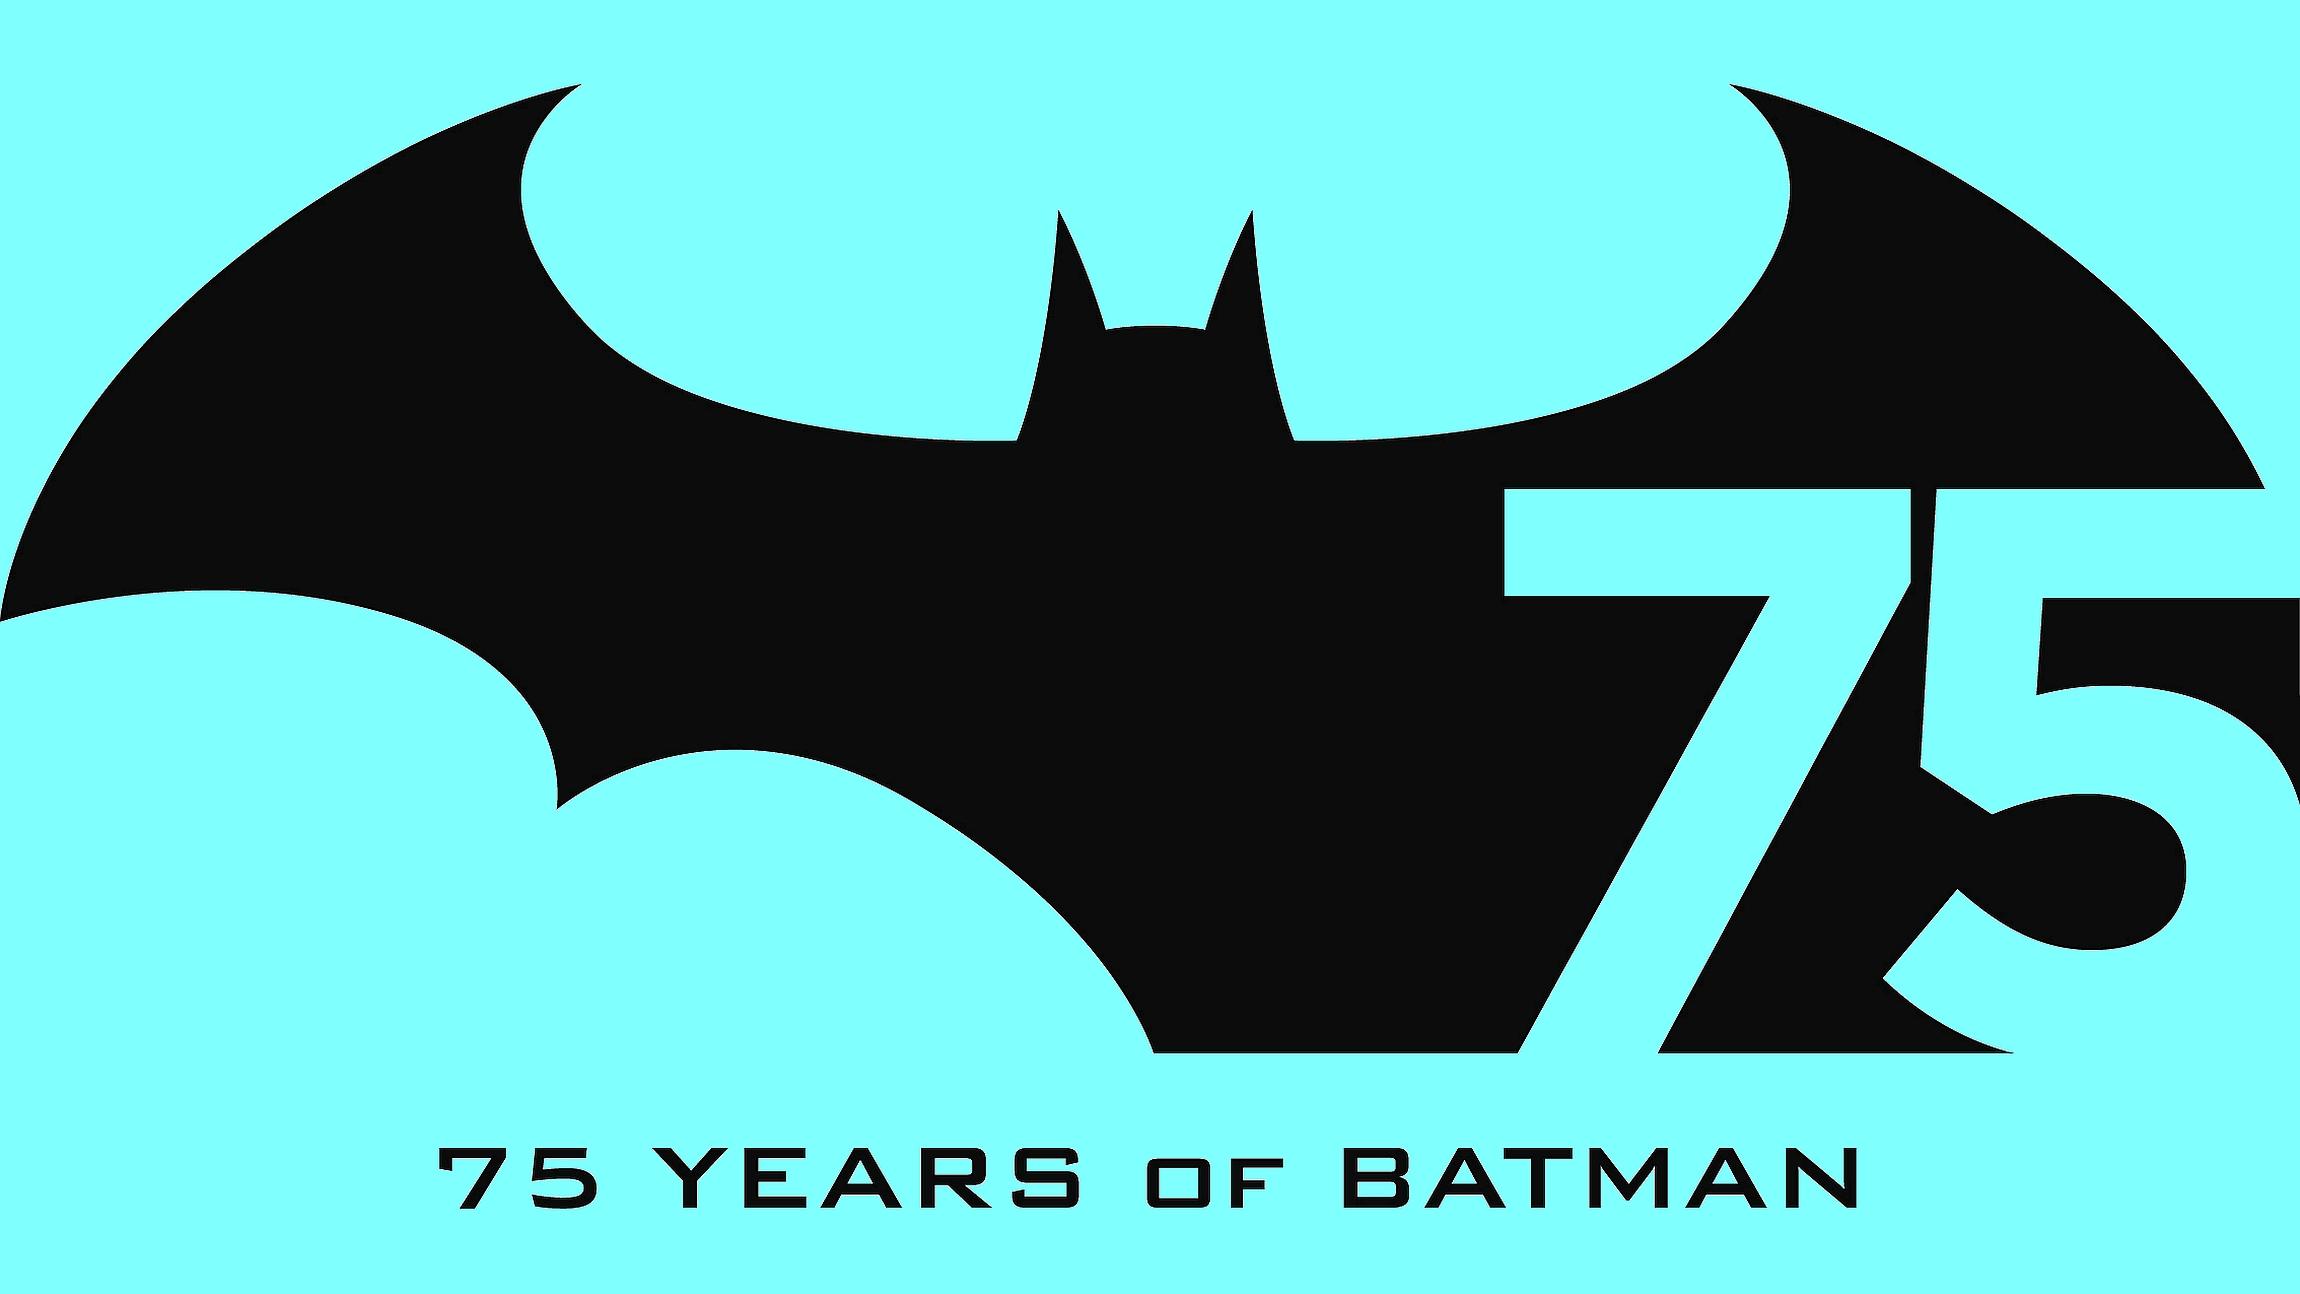 Fondos De Escritorio Hd Dc: 75 Years Of Batman Full HD Fondo De Pantalla And Fondo De